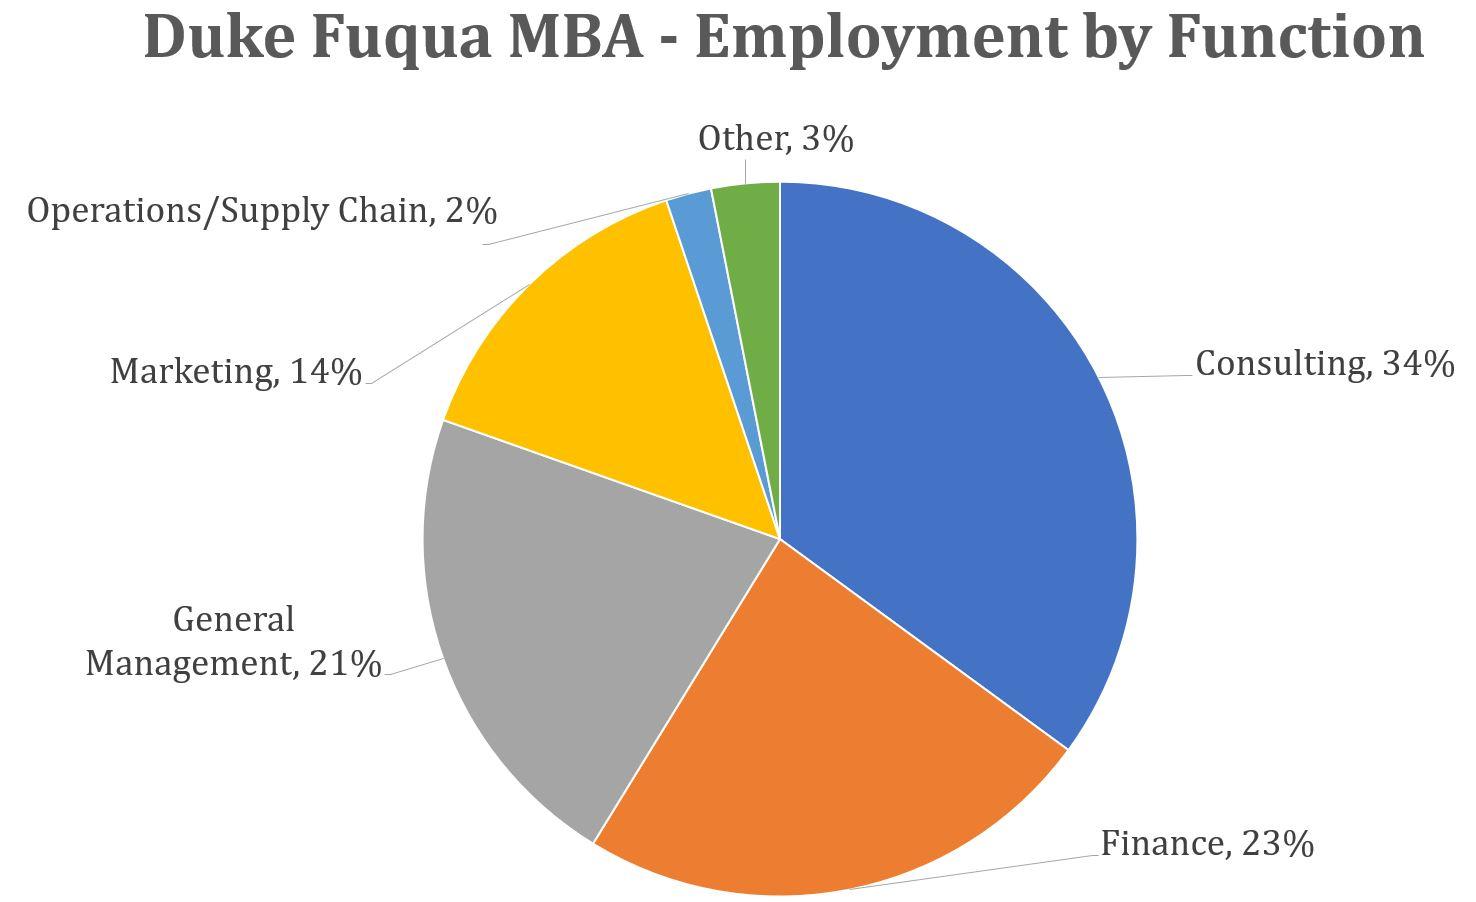 Duke-fuqua-mba-employment-by-function